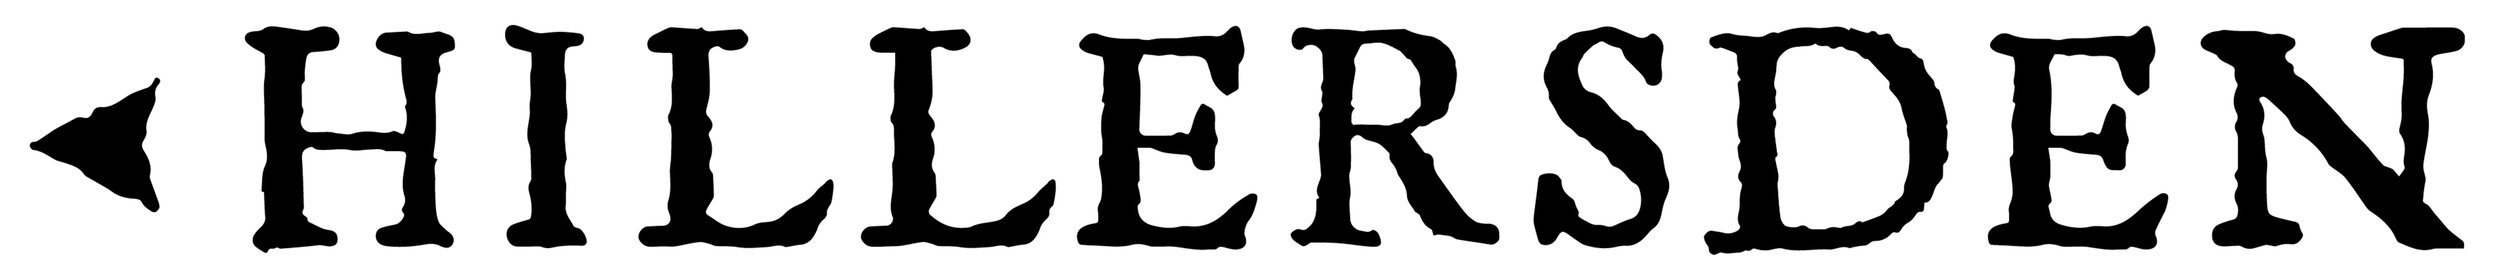 Hillersden-Logo.jpg